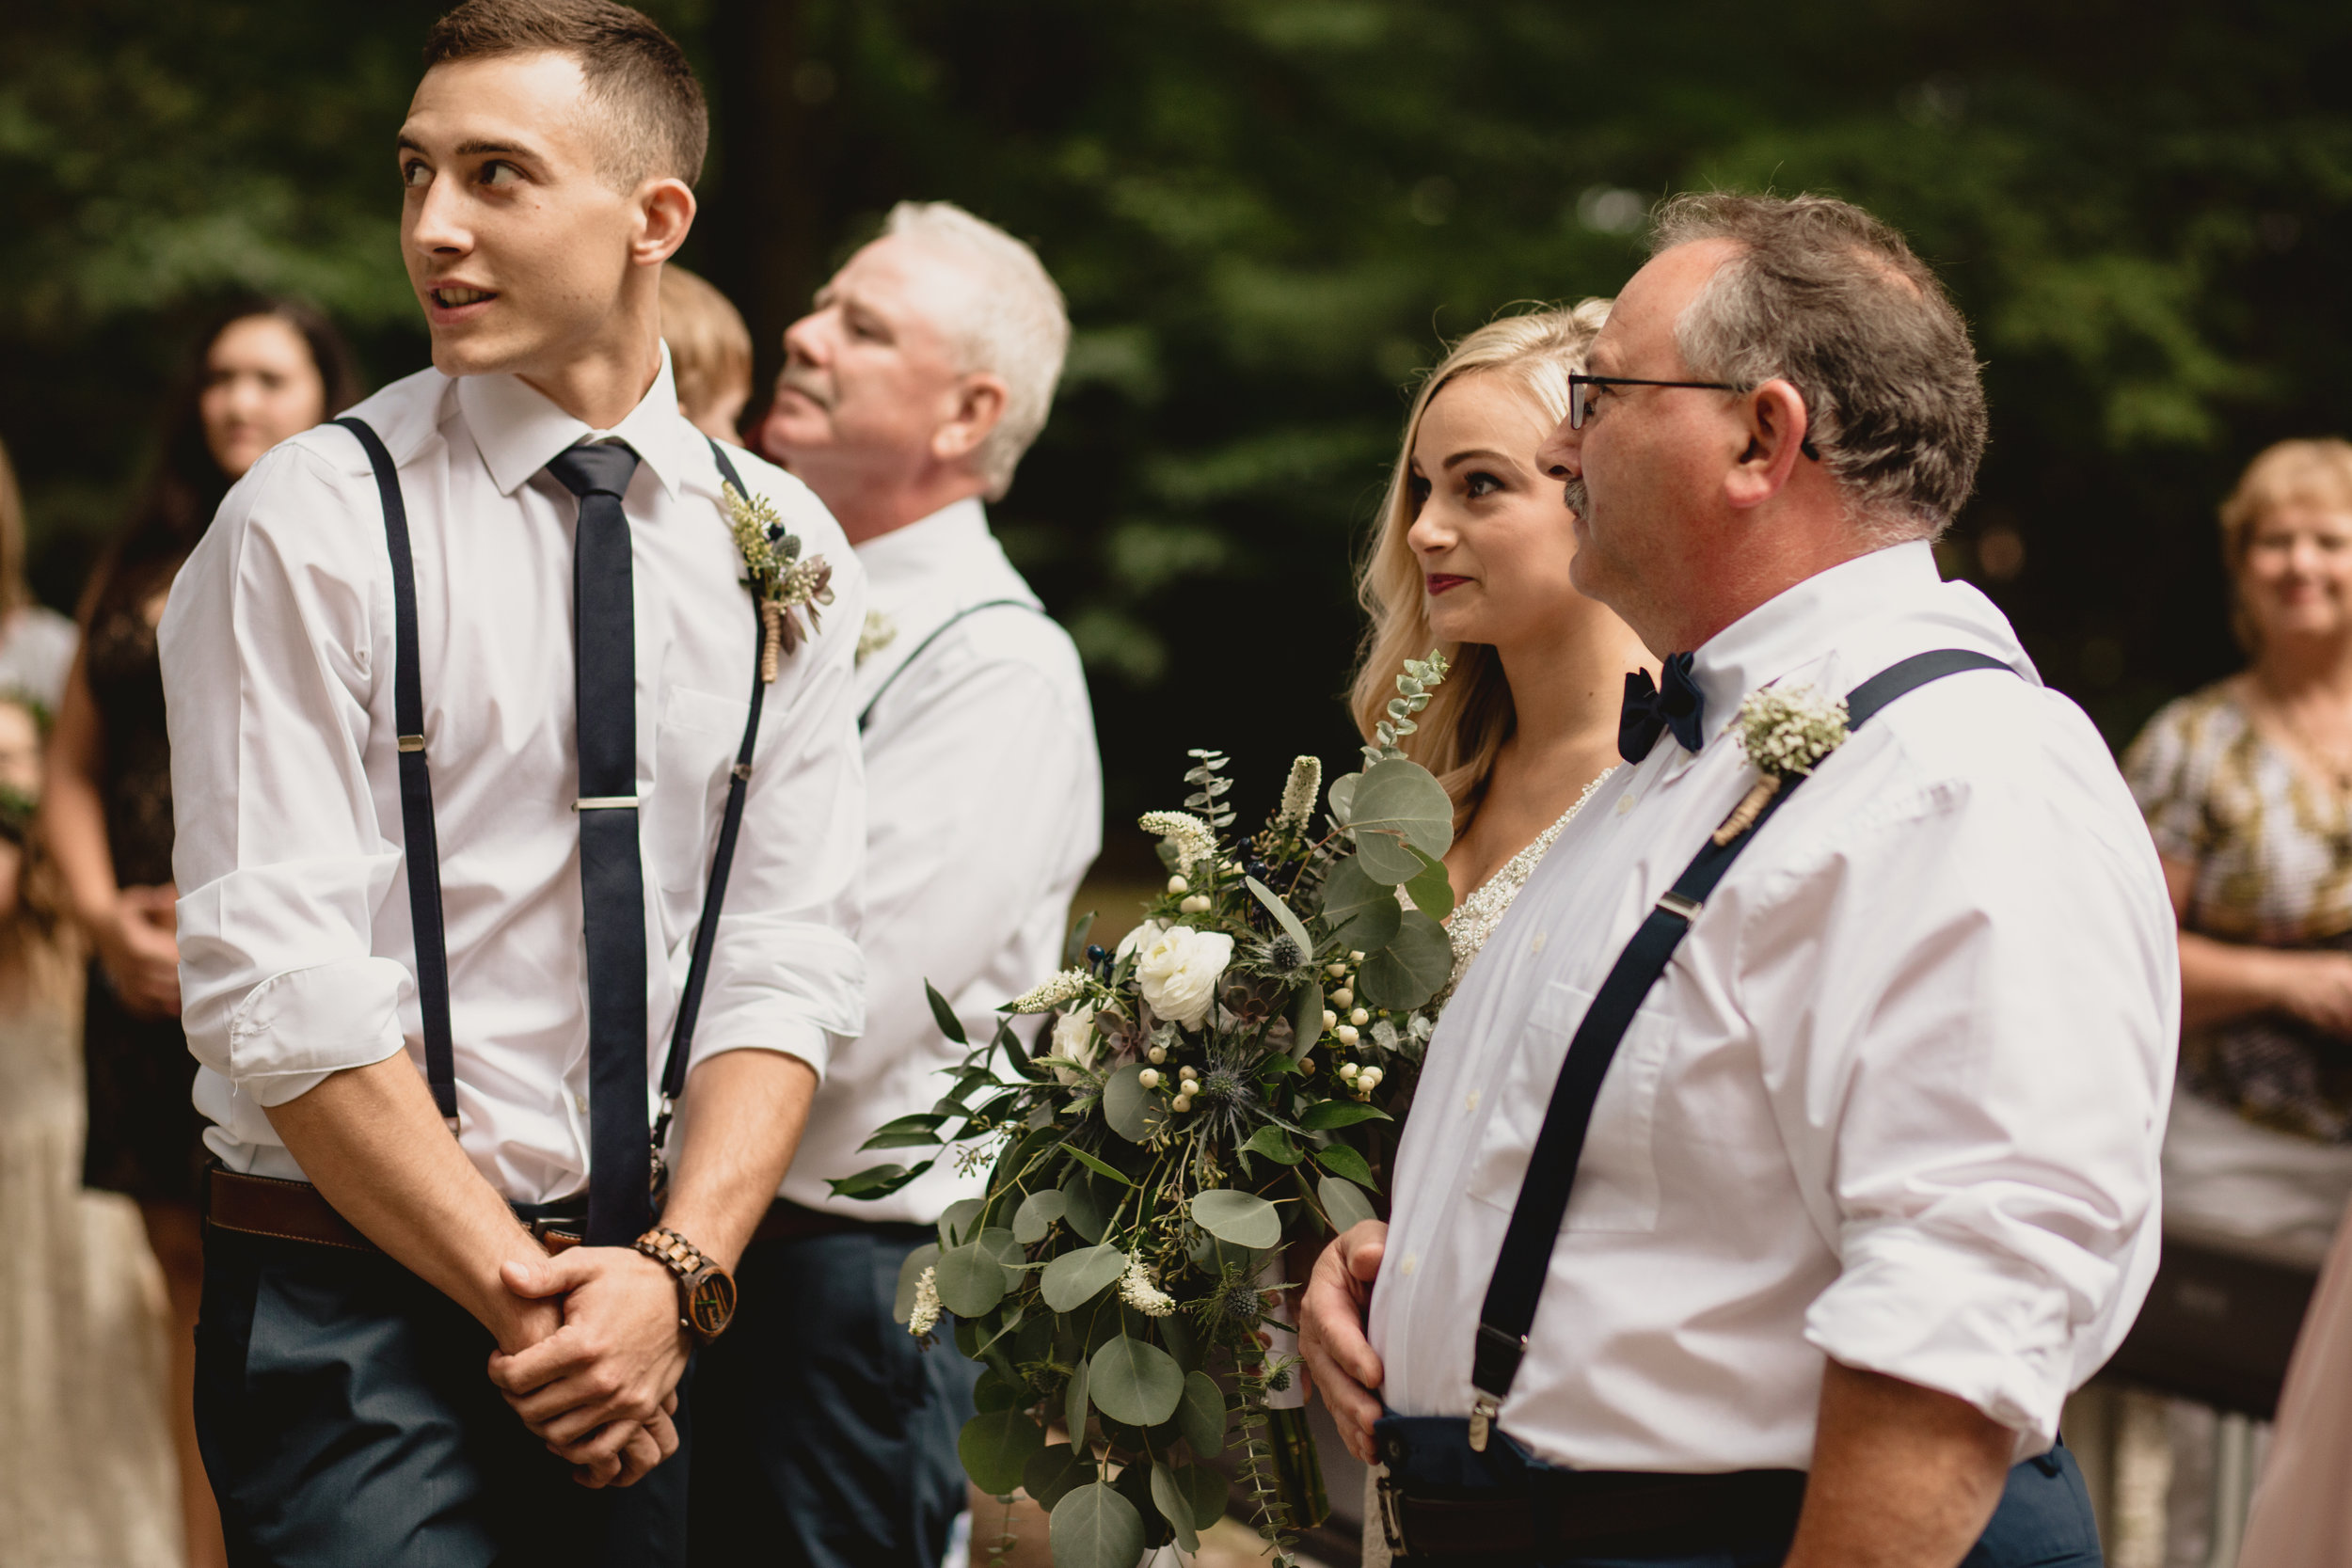 west-michigan-wedding-photographer-whitehall-rachel-austin-chapel-in-the-pines-257.jpg